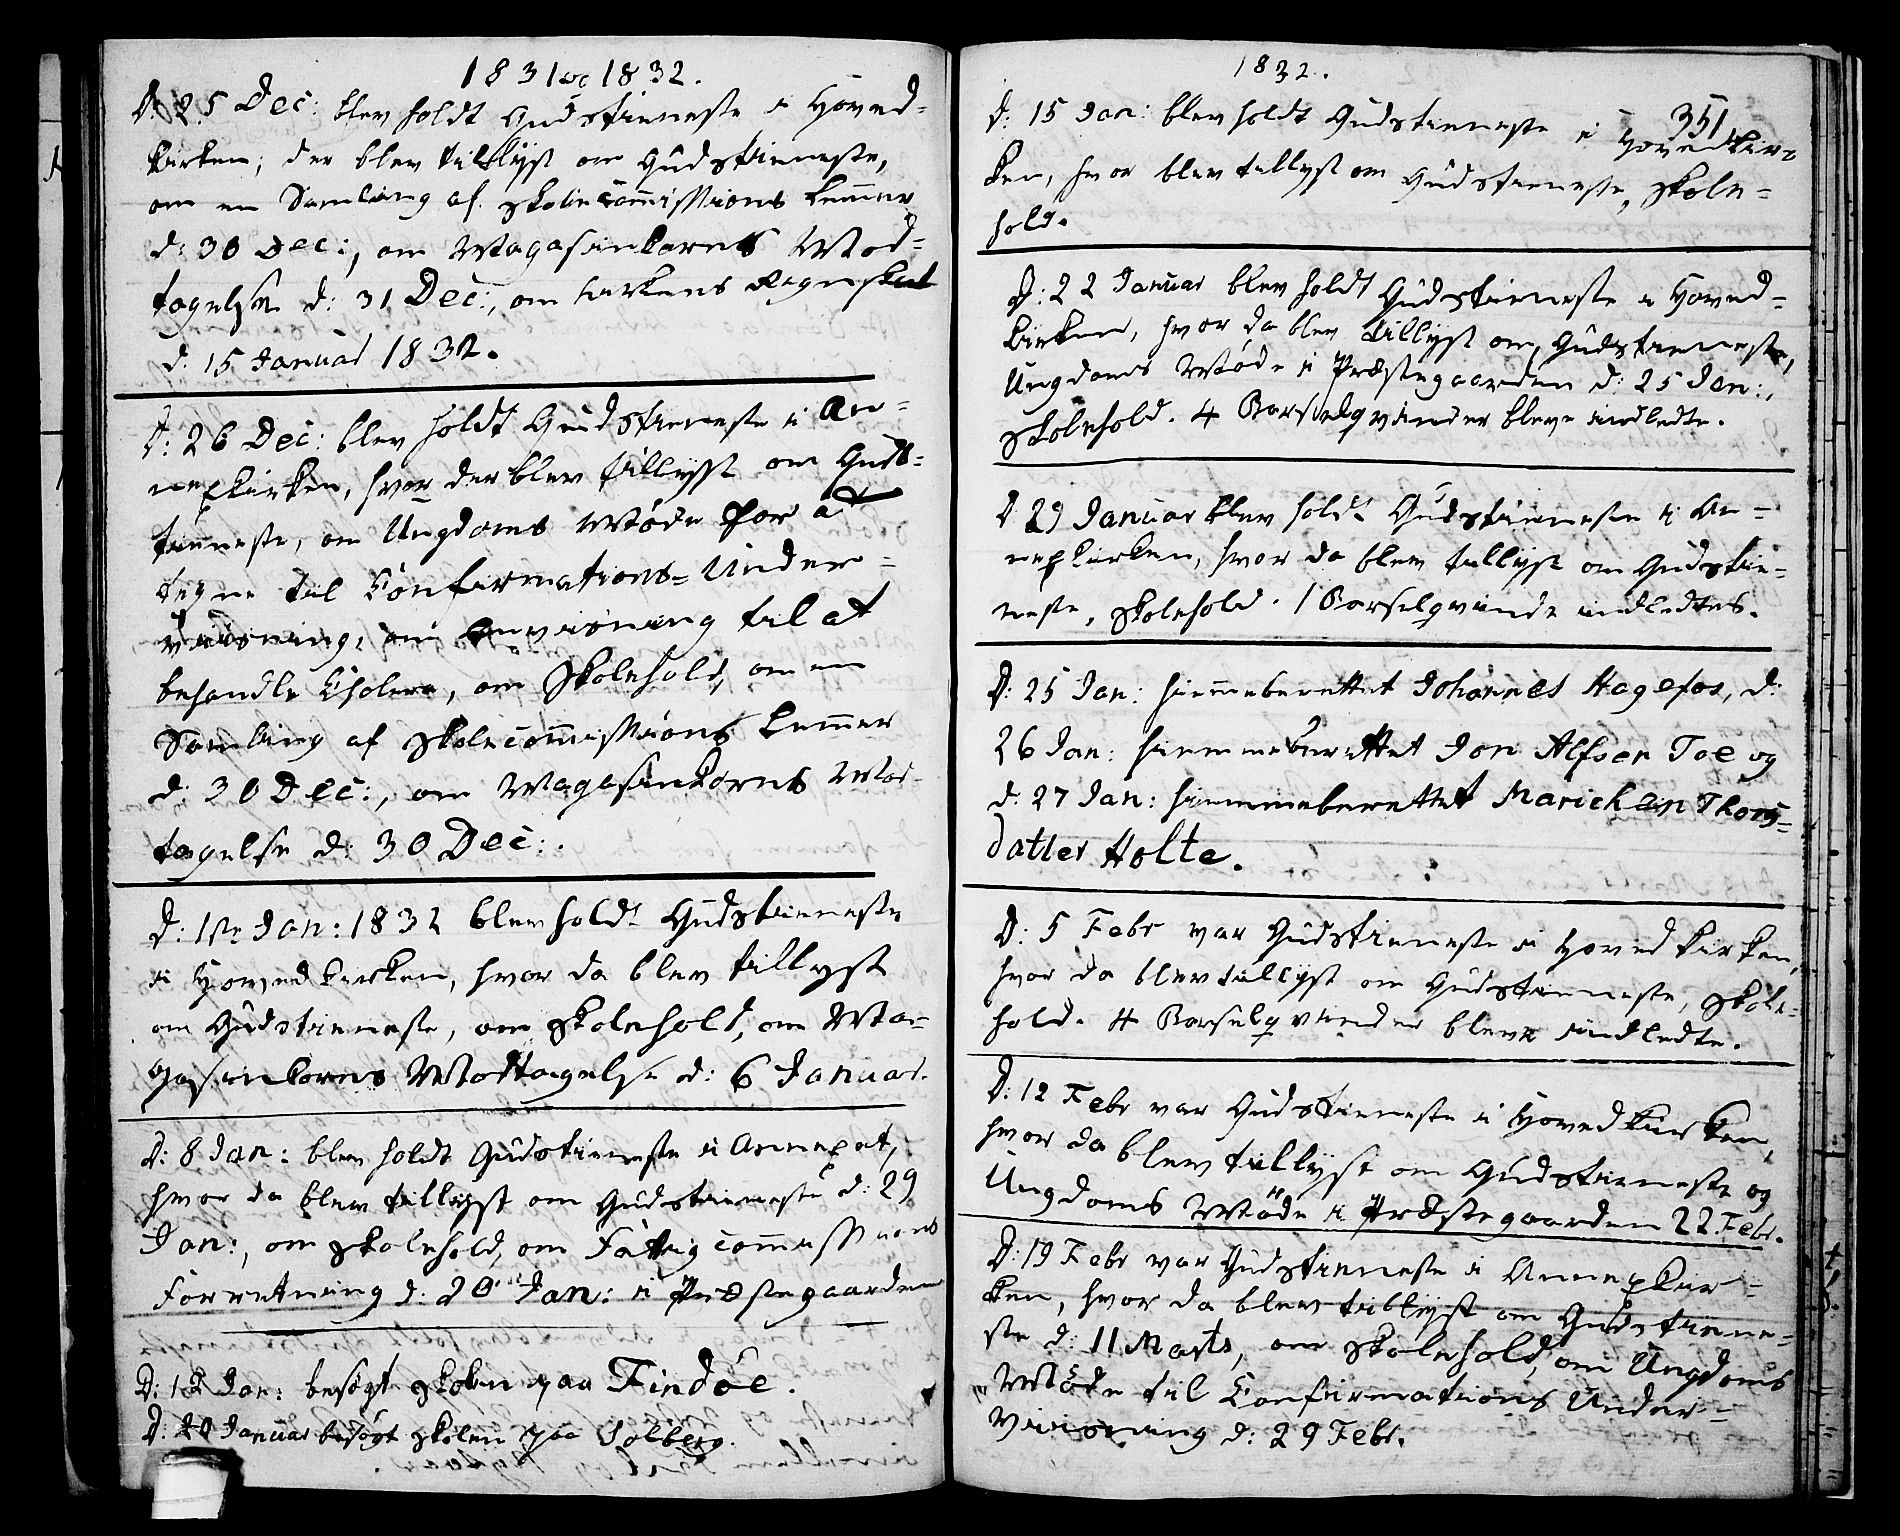 SAKO, Drangedal kirkebøker, F/Fa/L0006: Ministerialbok nr. 6, 1831-1837, s. 351